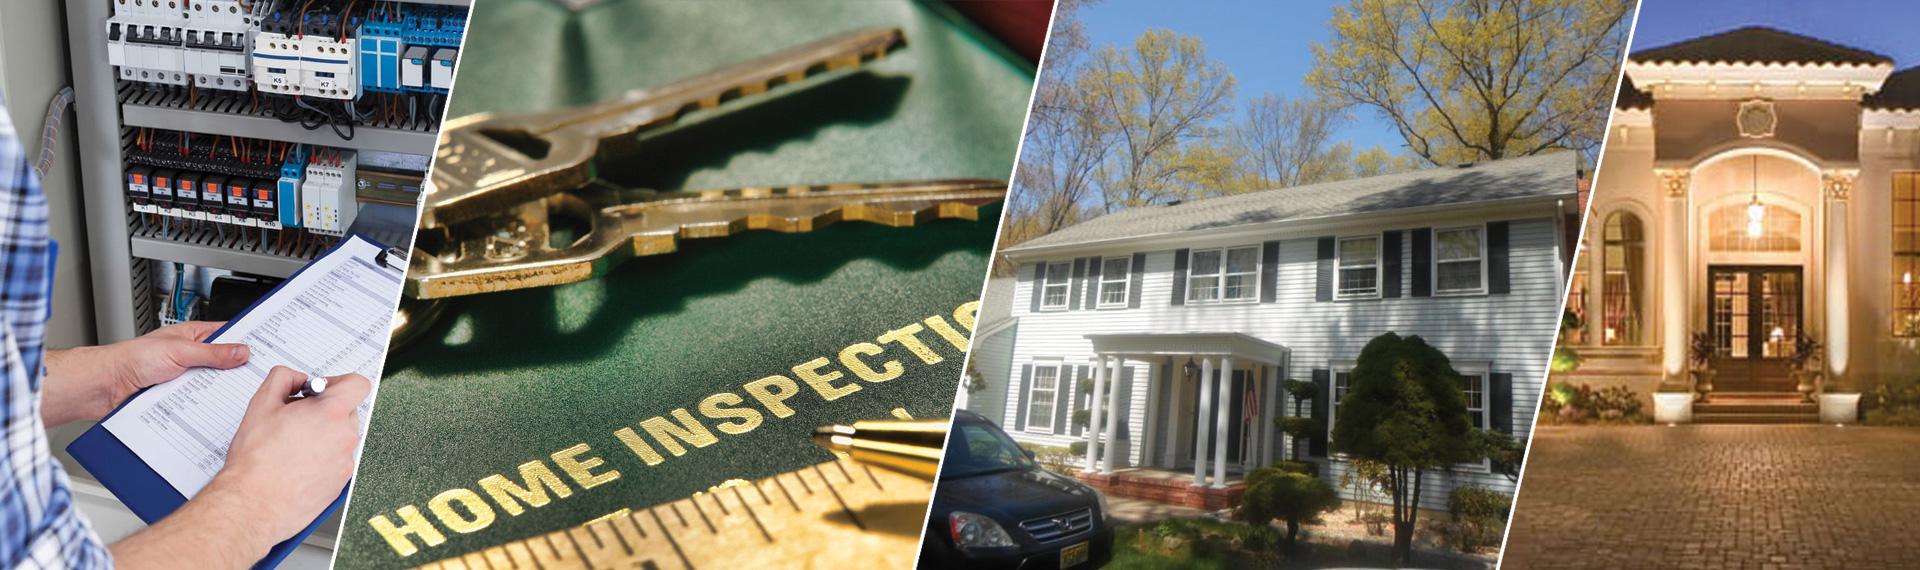 AAA House Doctors Engineers & Home Inspectors Edisom NJ